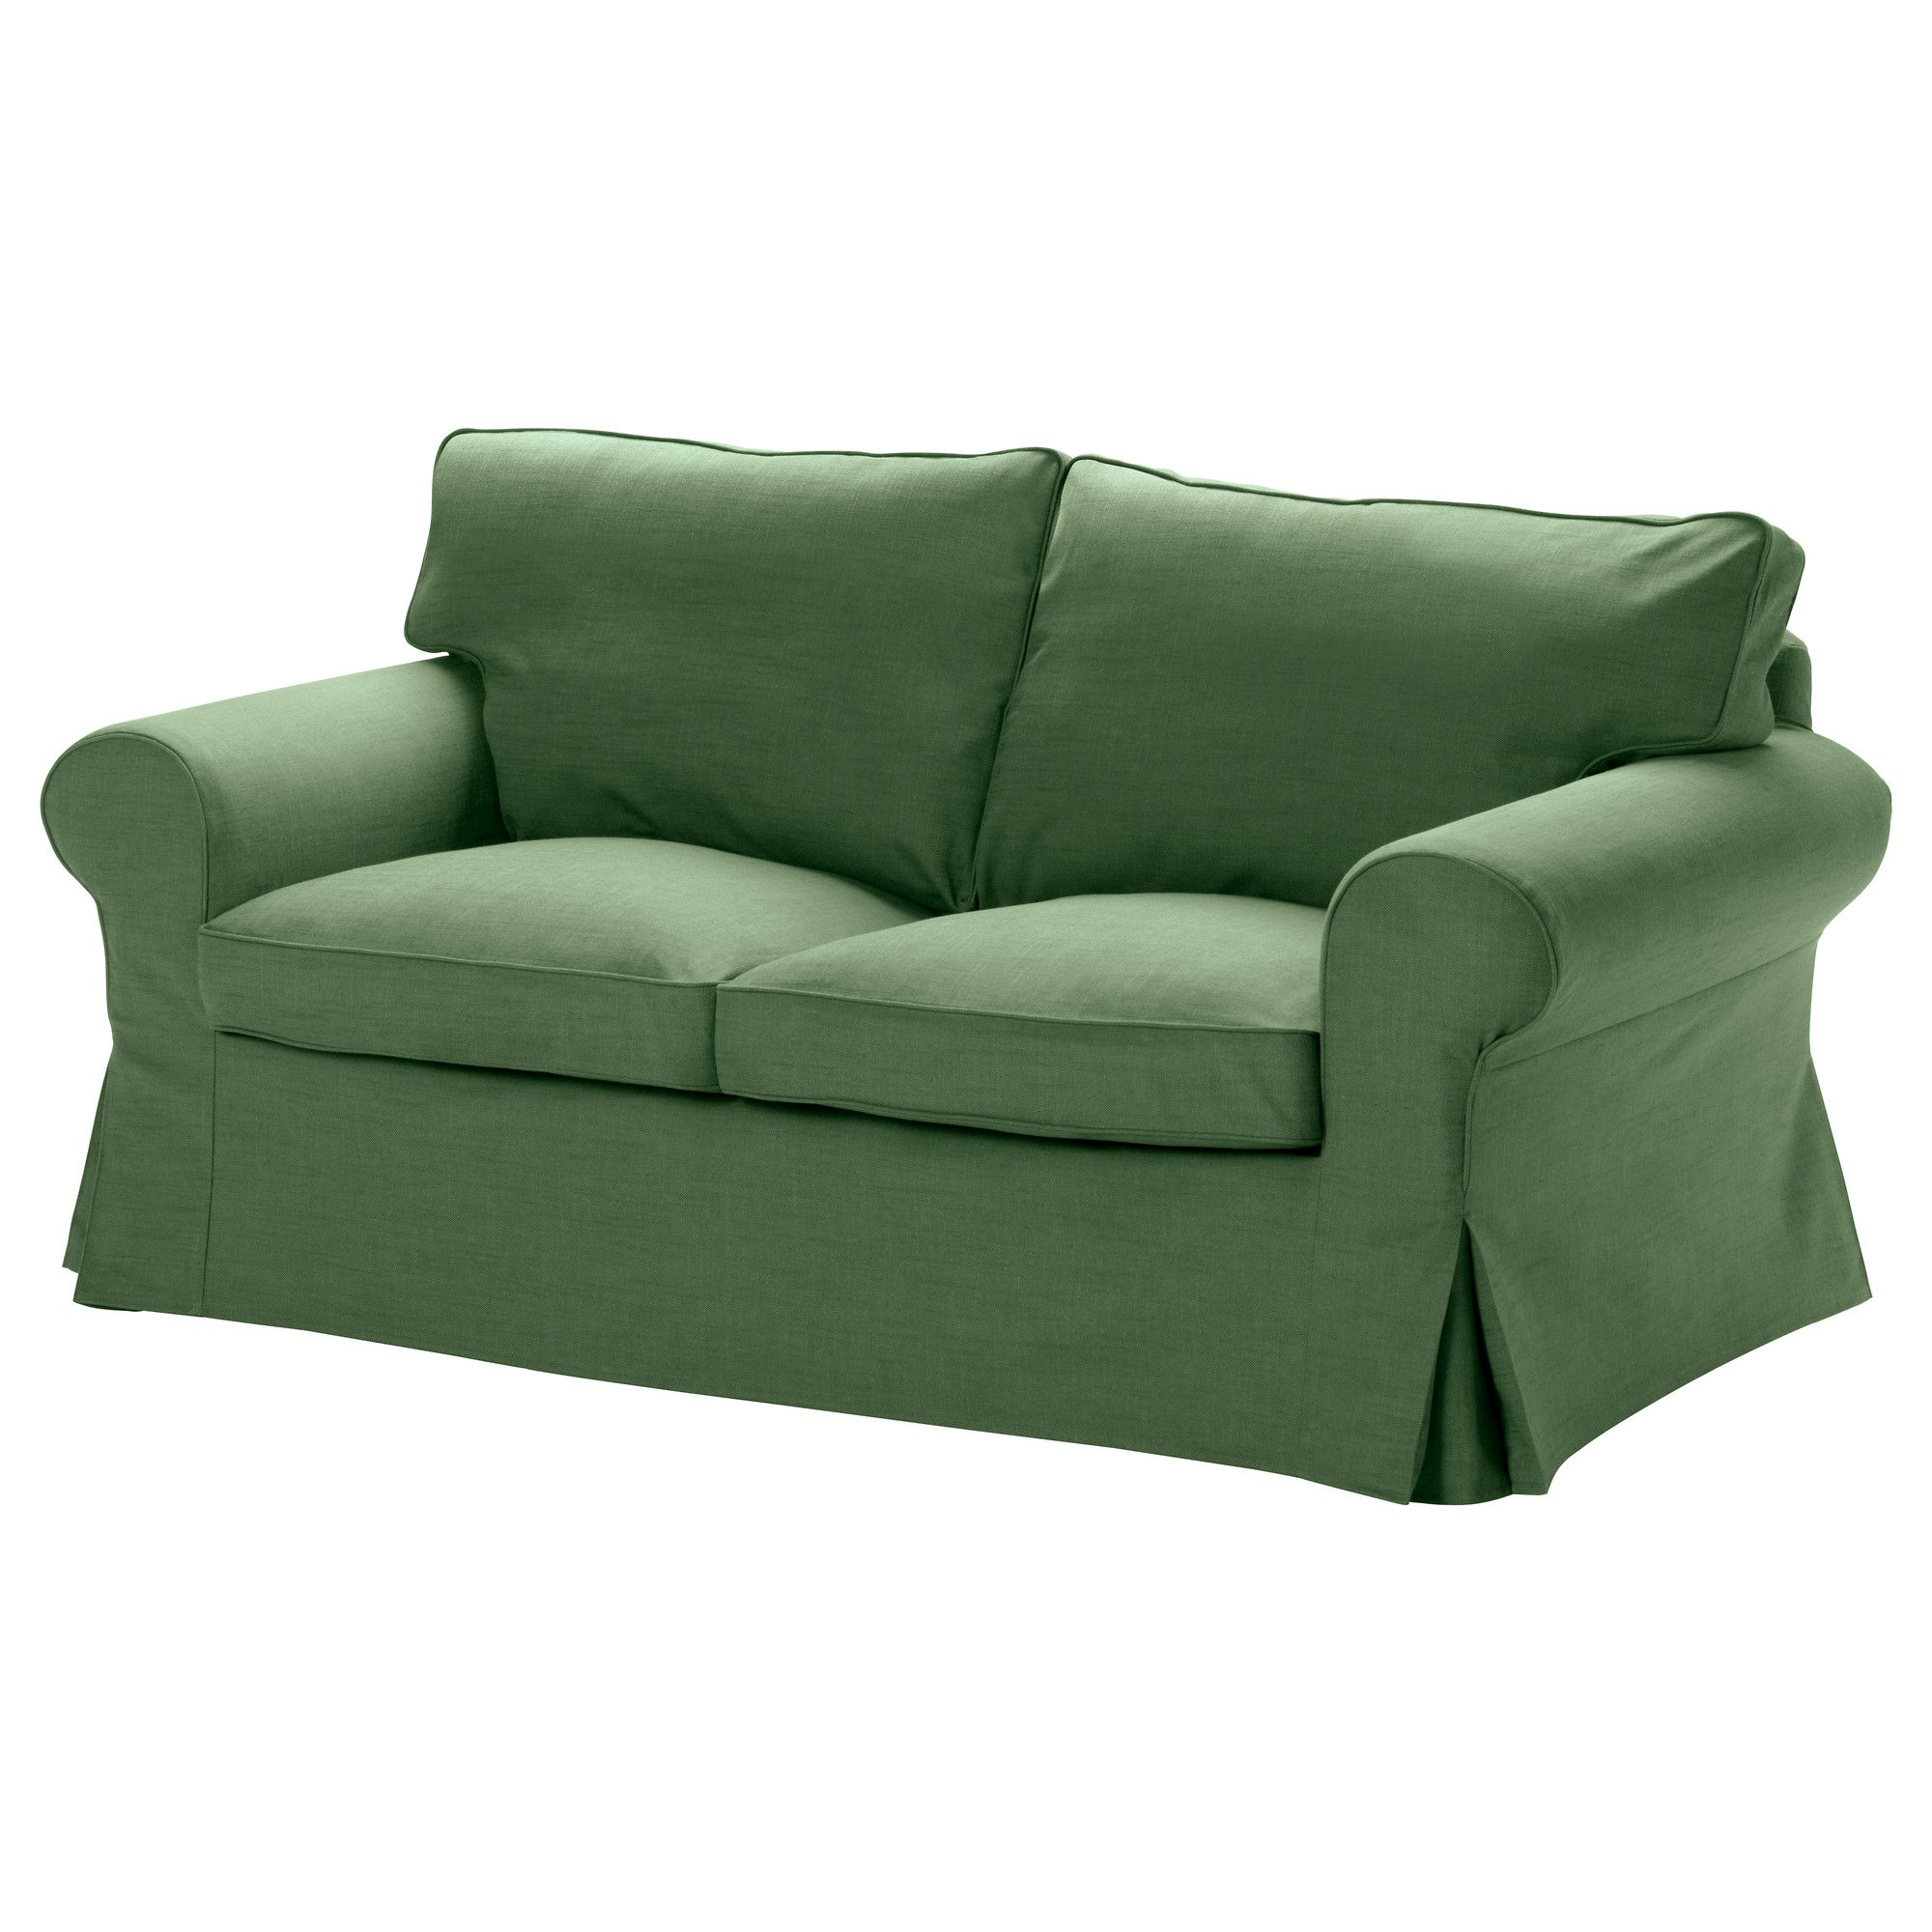 US Furniture and Home Furnishings Ikea sofa, Loveseat